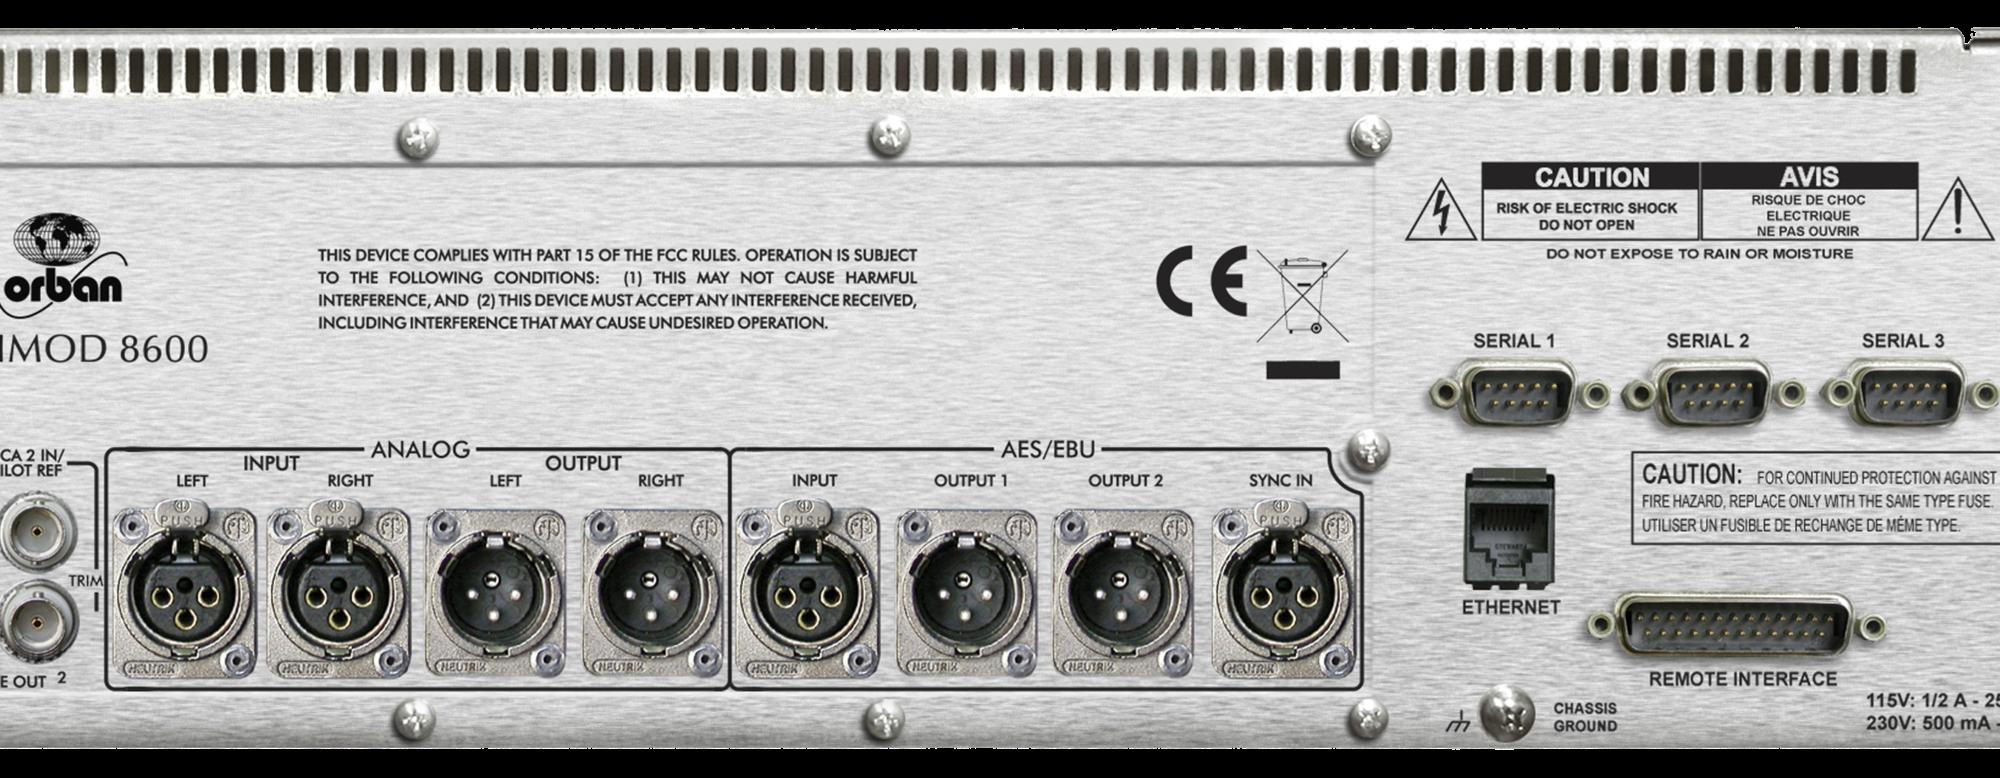 Optimod-FM 8600 HD – orban